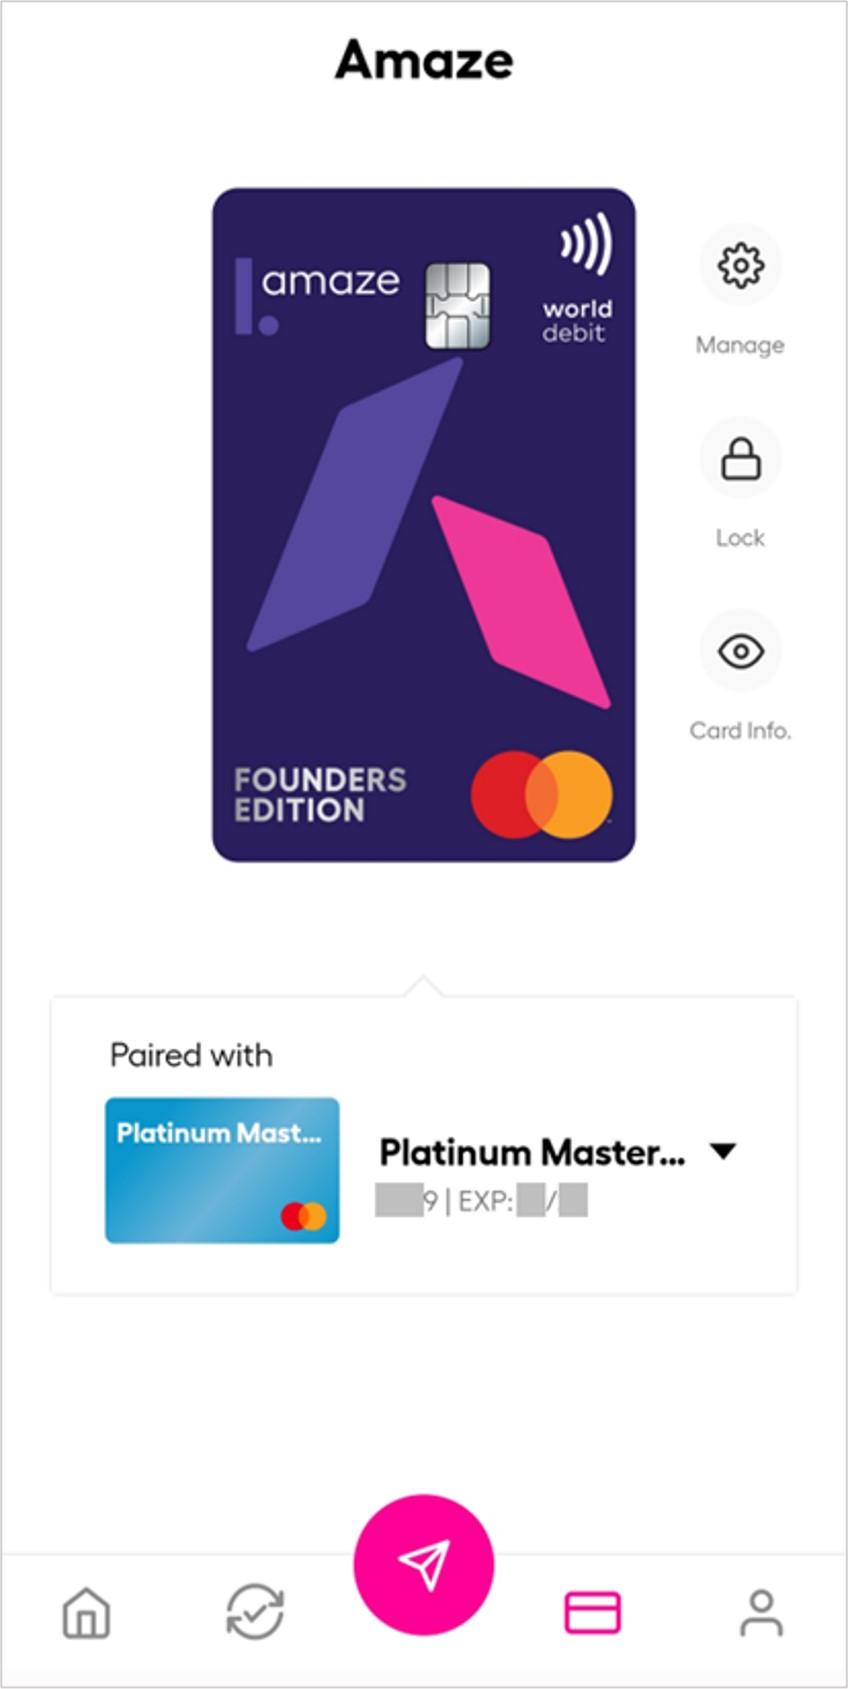 Paired Mastercard on amaze